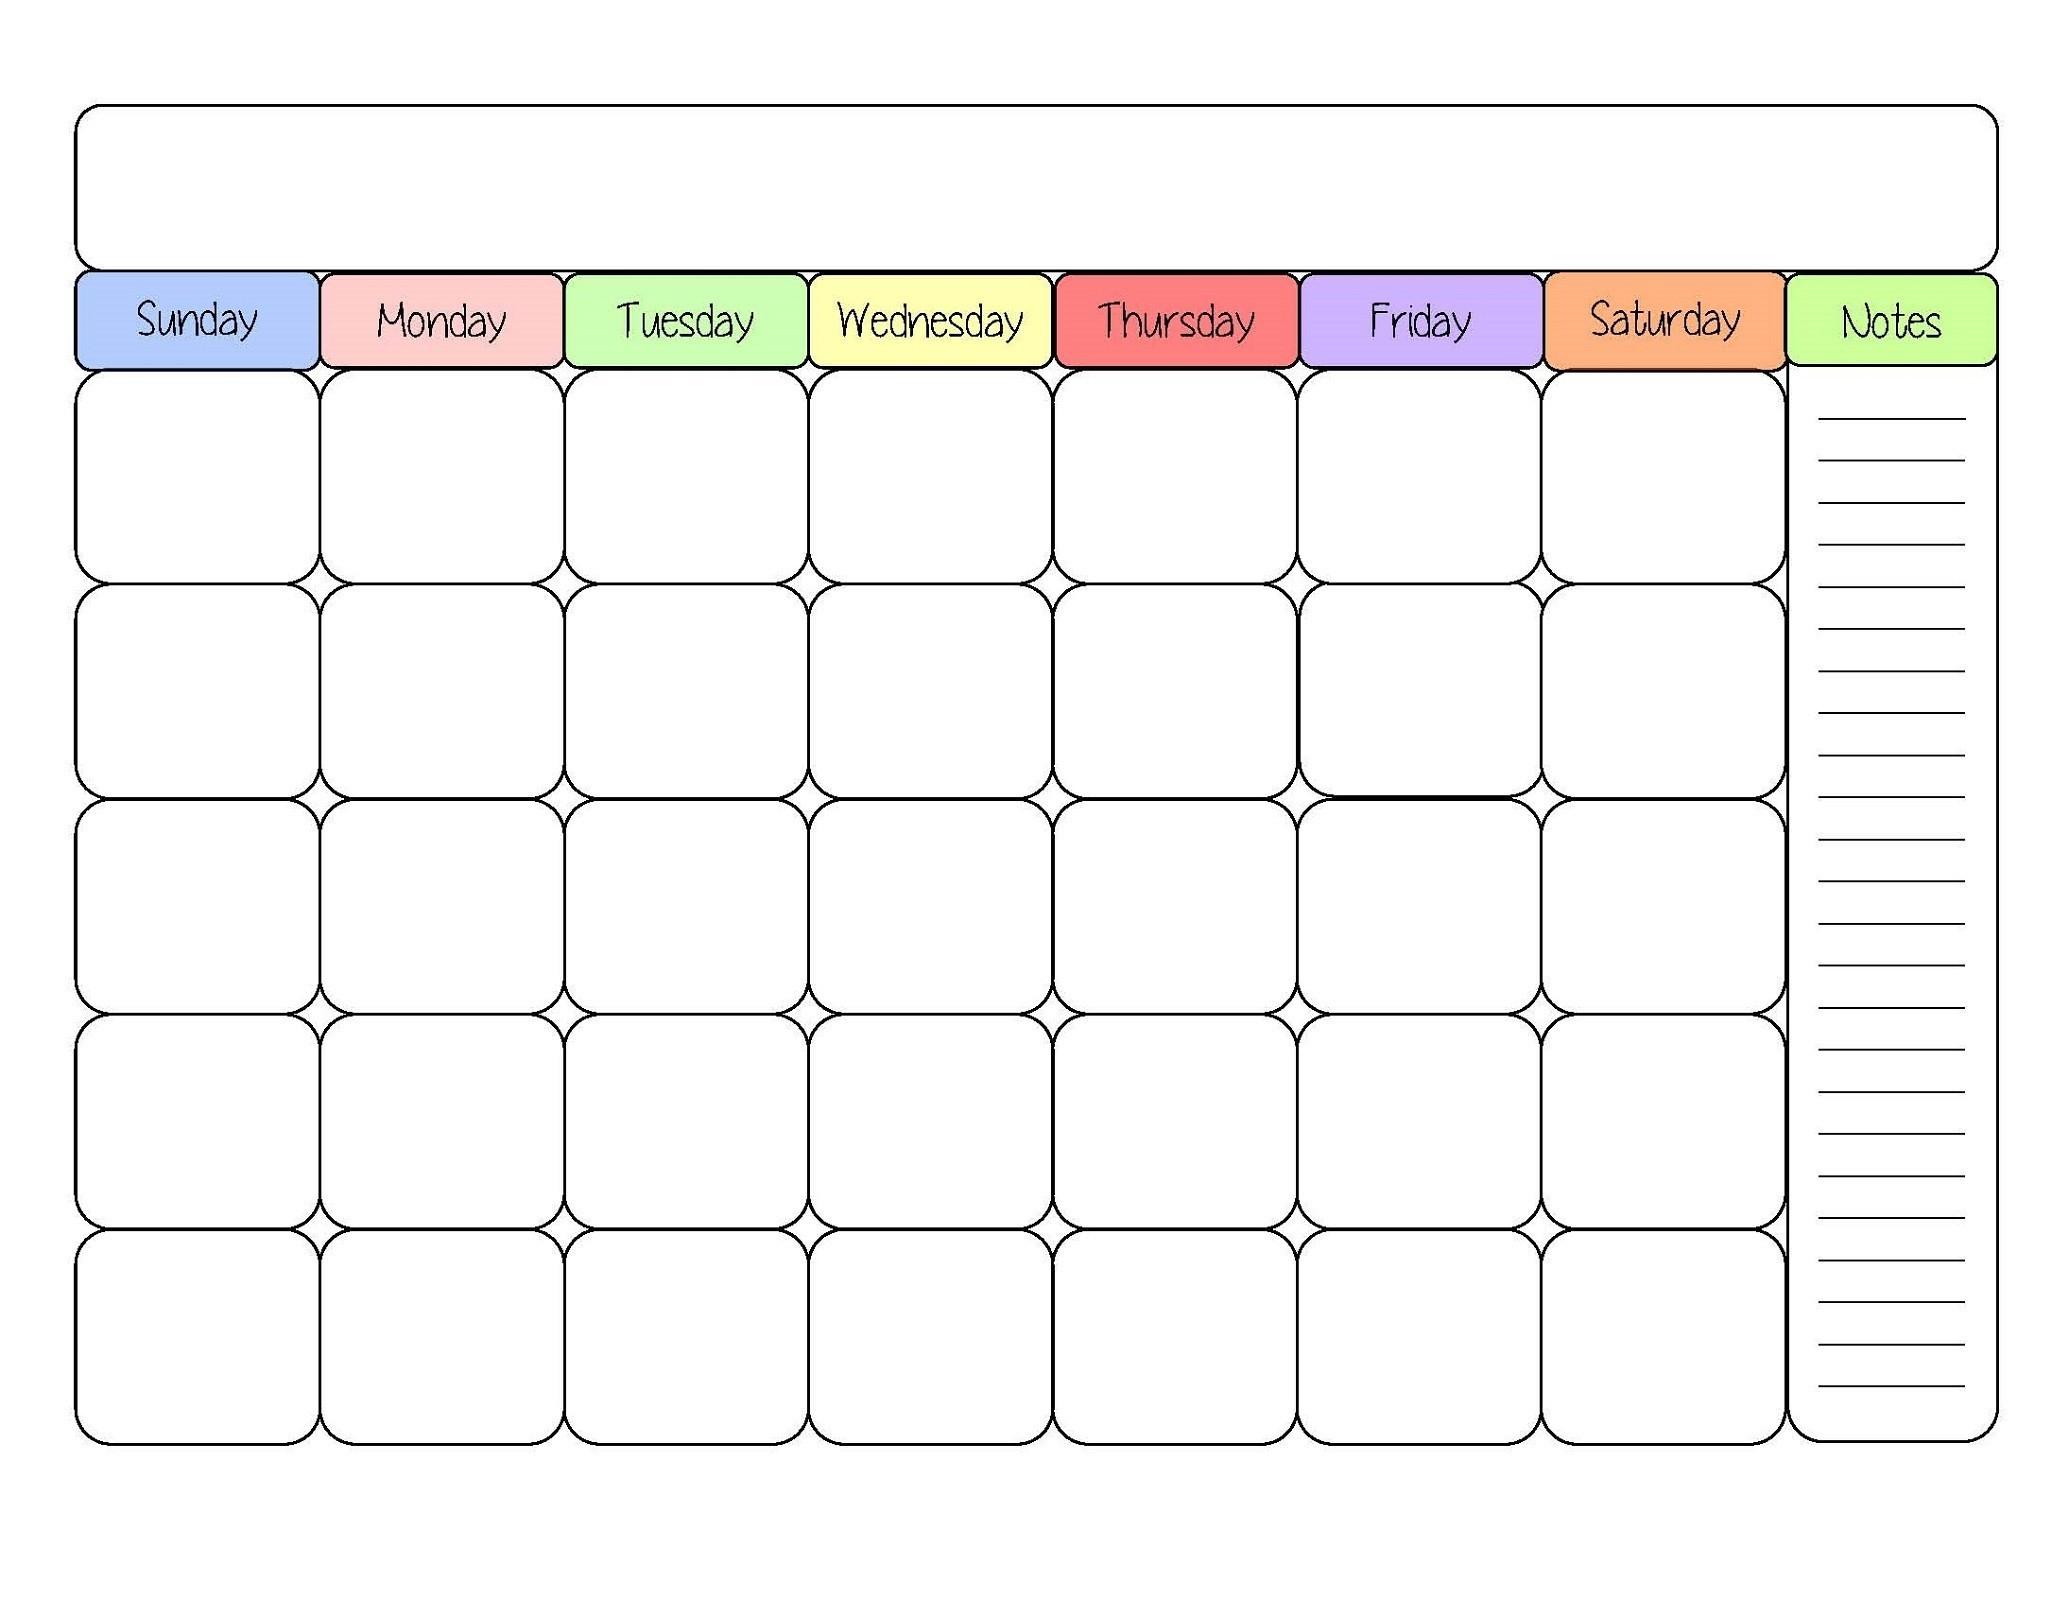 Free Printable Calendar Templates Interesting In Fill In  Printable Fill In Calendar Temoplate